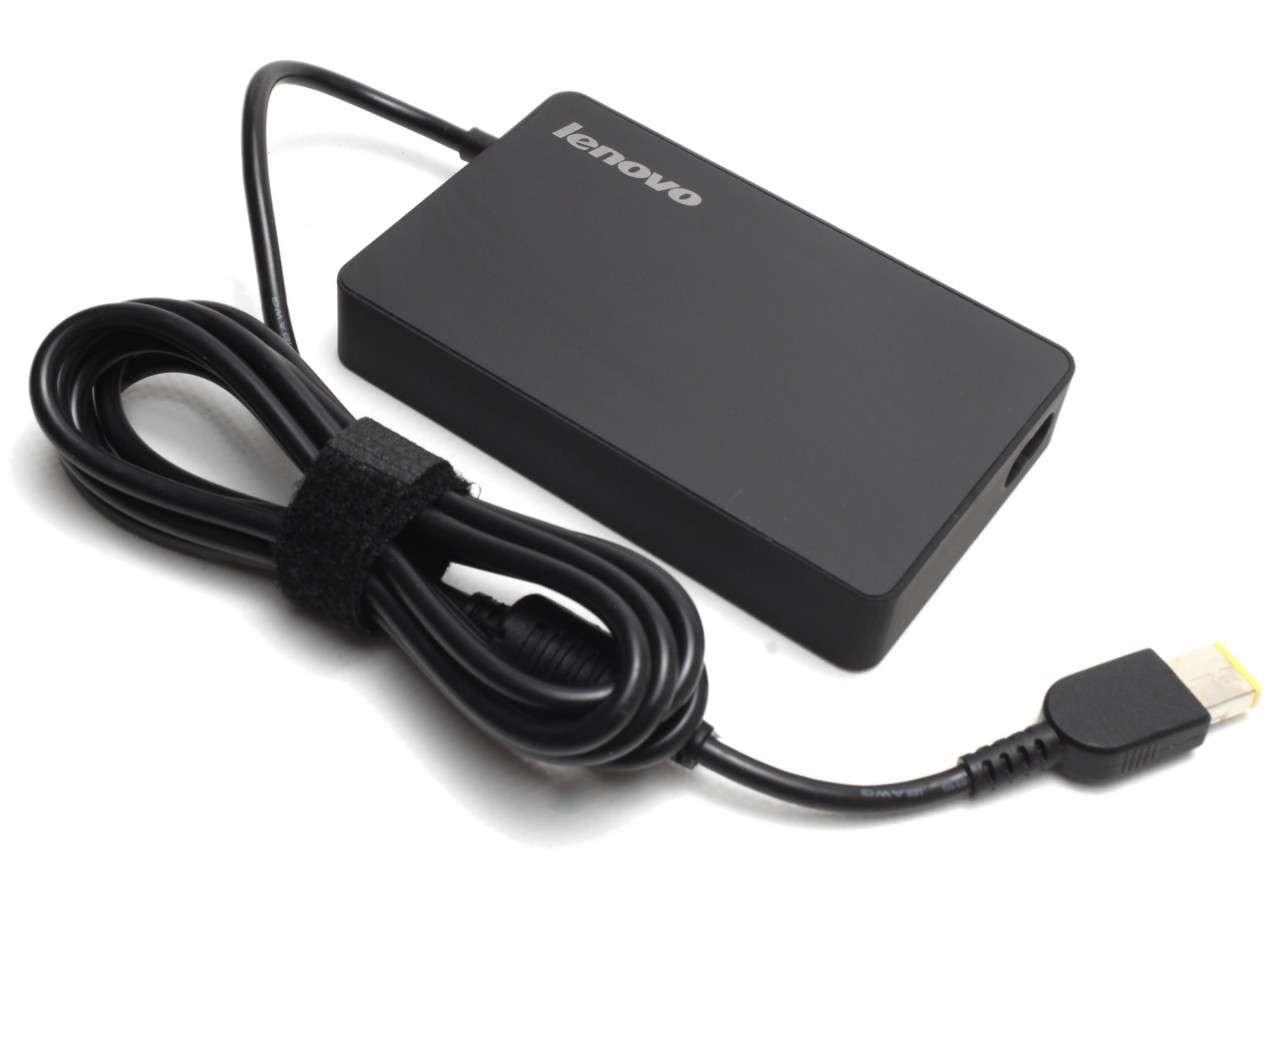 Incarcator Lenovo S41 65W imagine powerlaptop.ro 2021